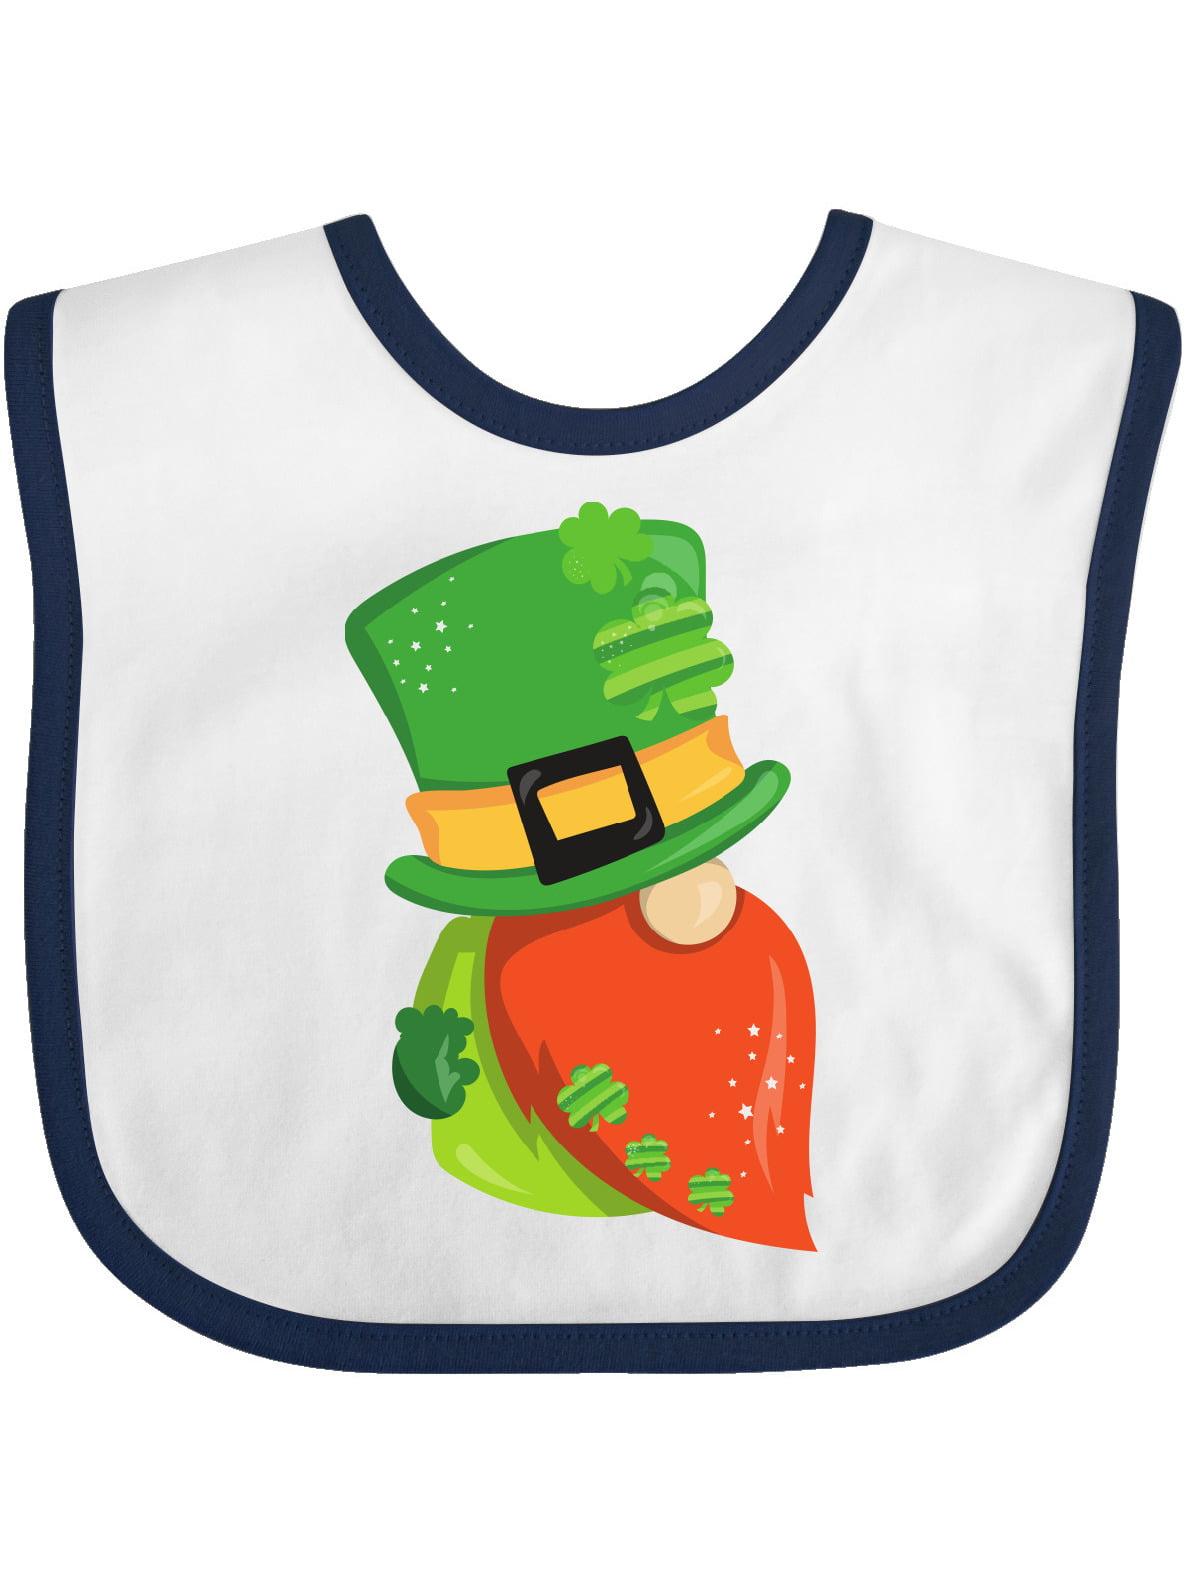 Download Saint Patrick's Day Gnome, Gnome With Orange Beard Baby ...